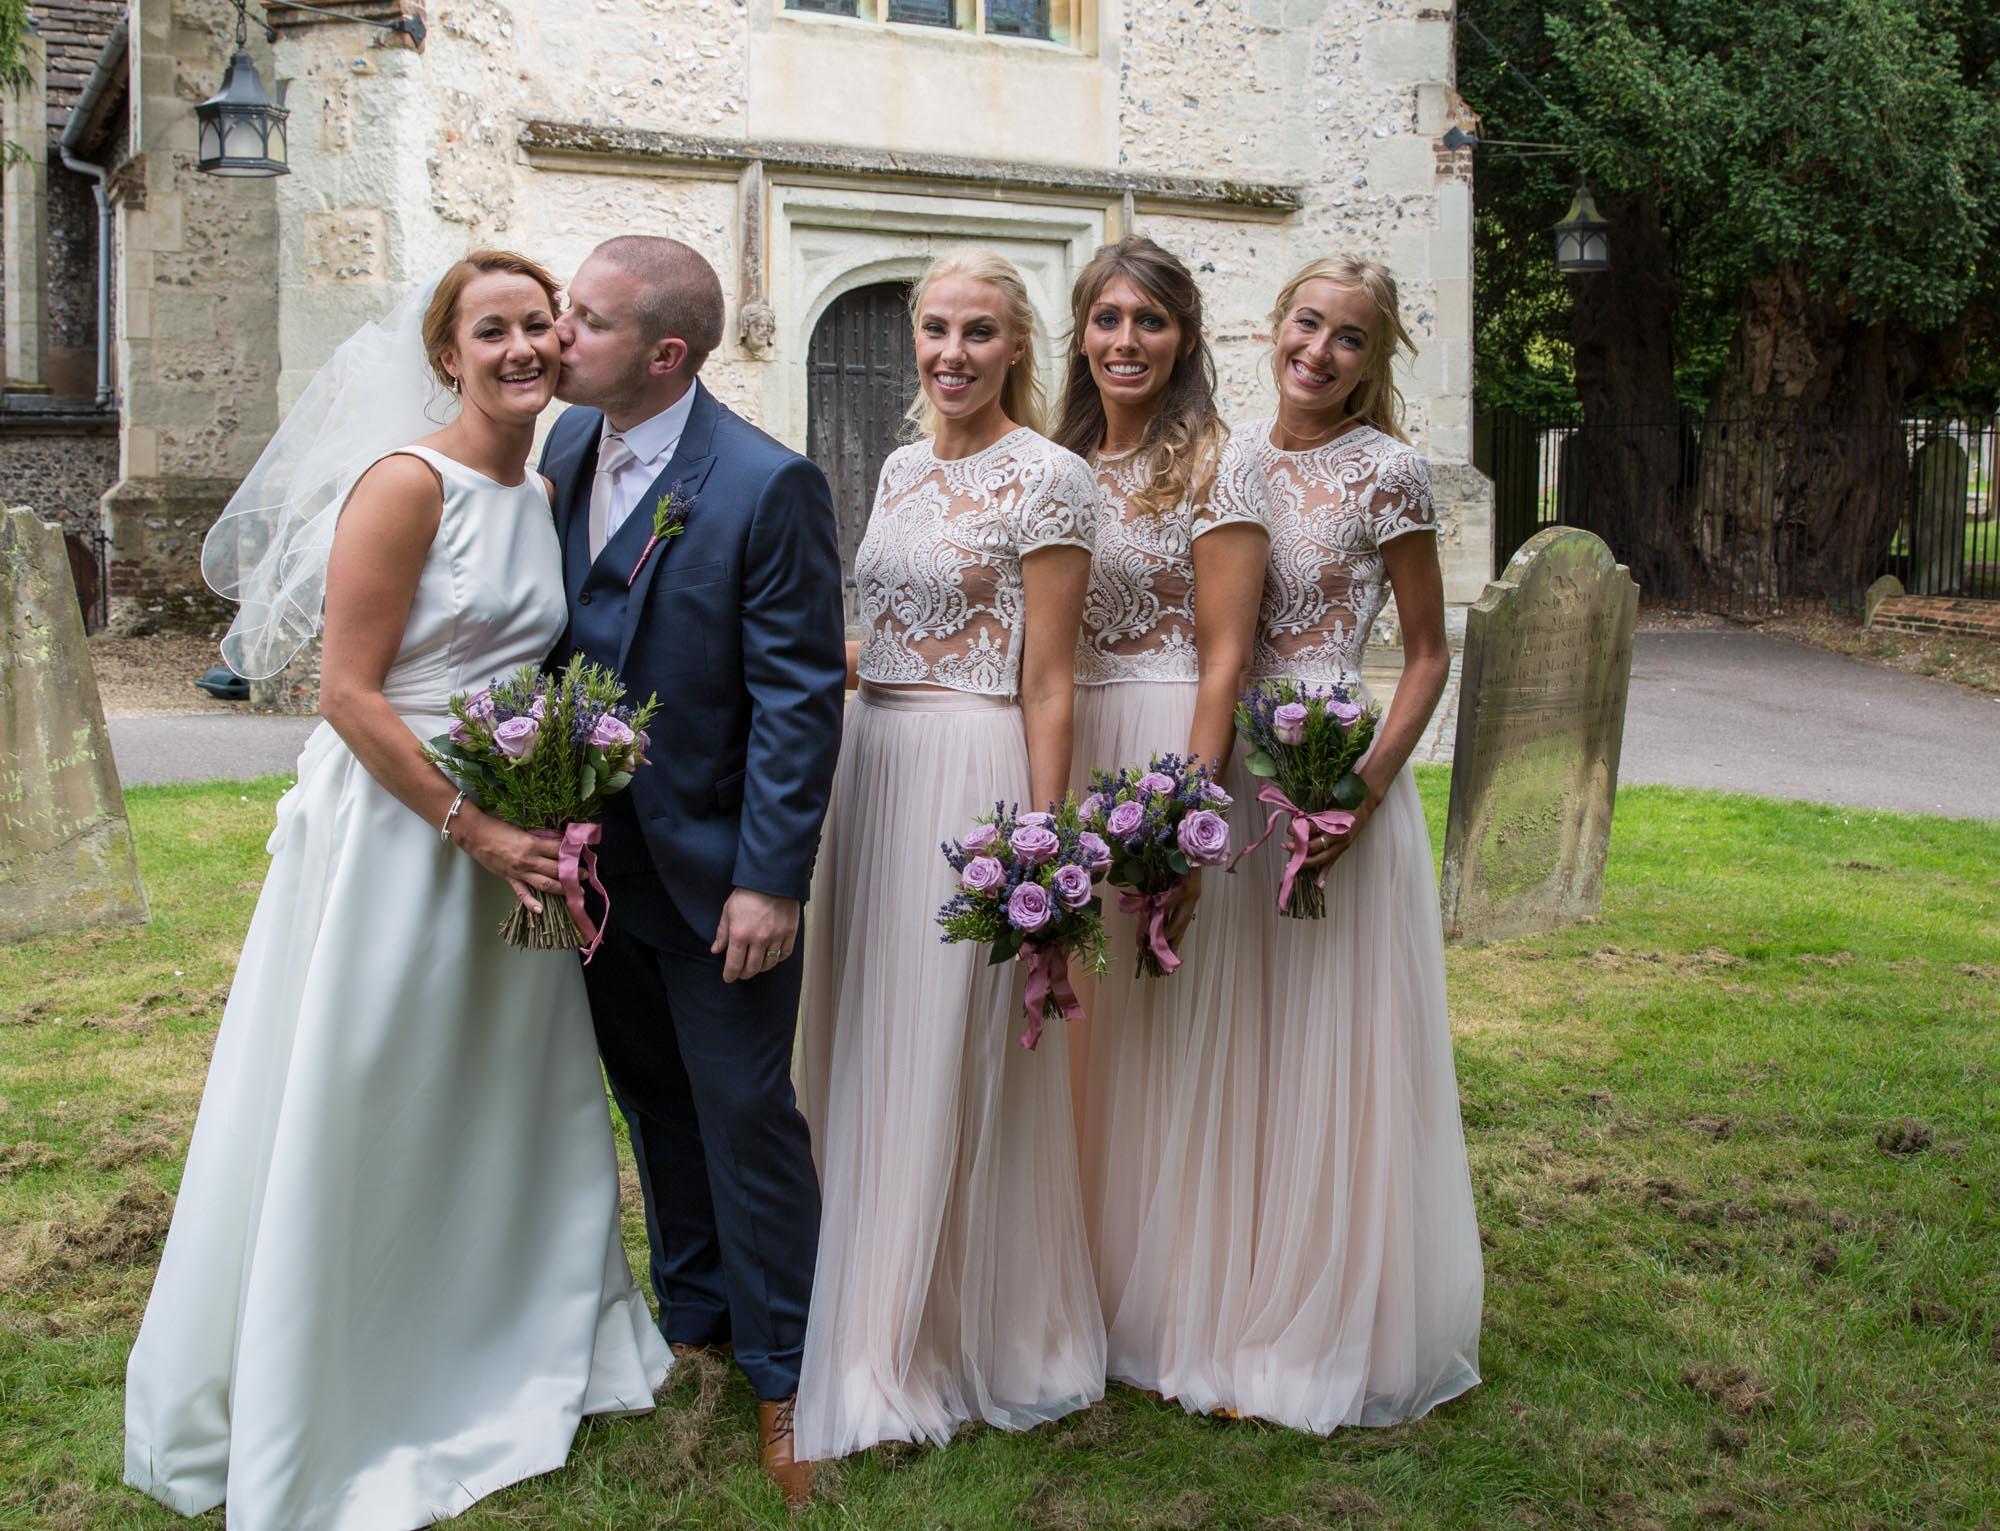 weddings-couples-love-photographer-oxford-london-jonathan-self-photography-56.jpg